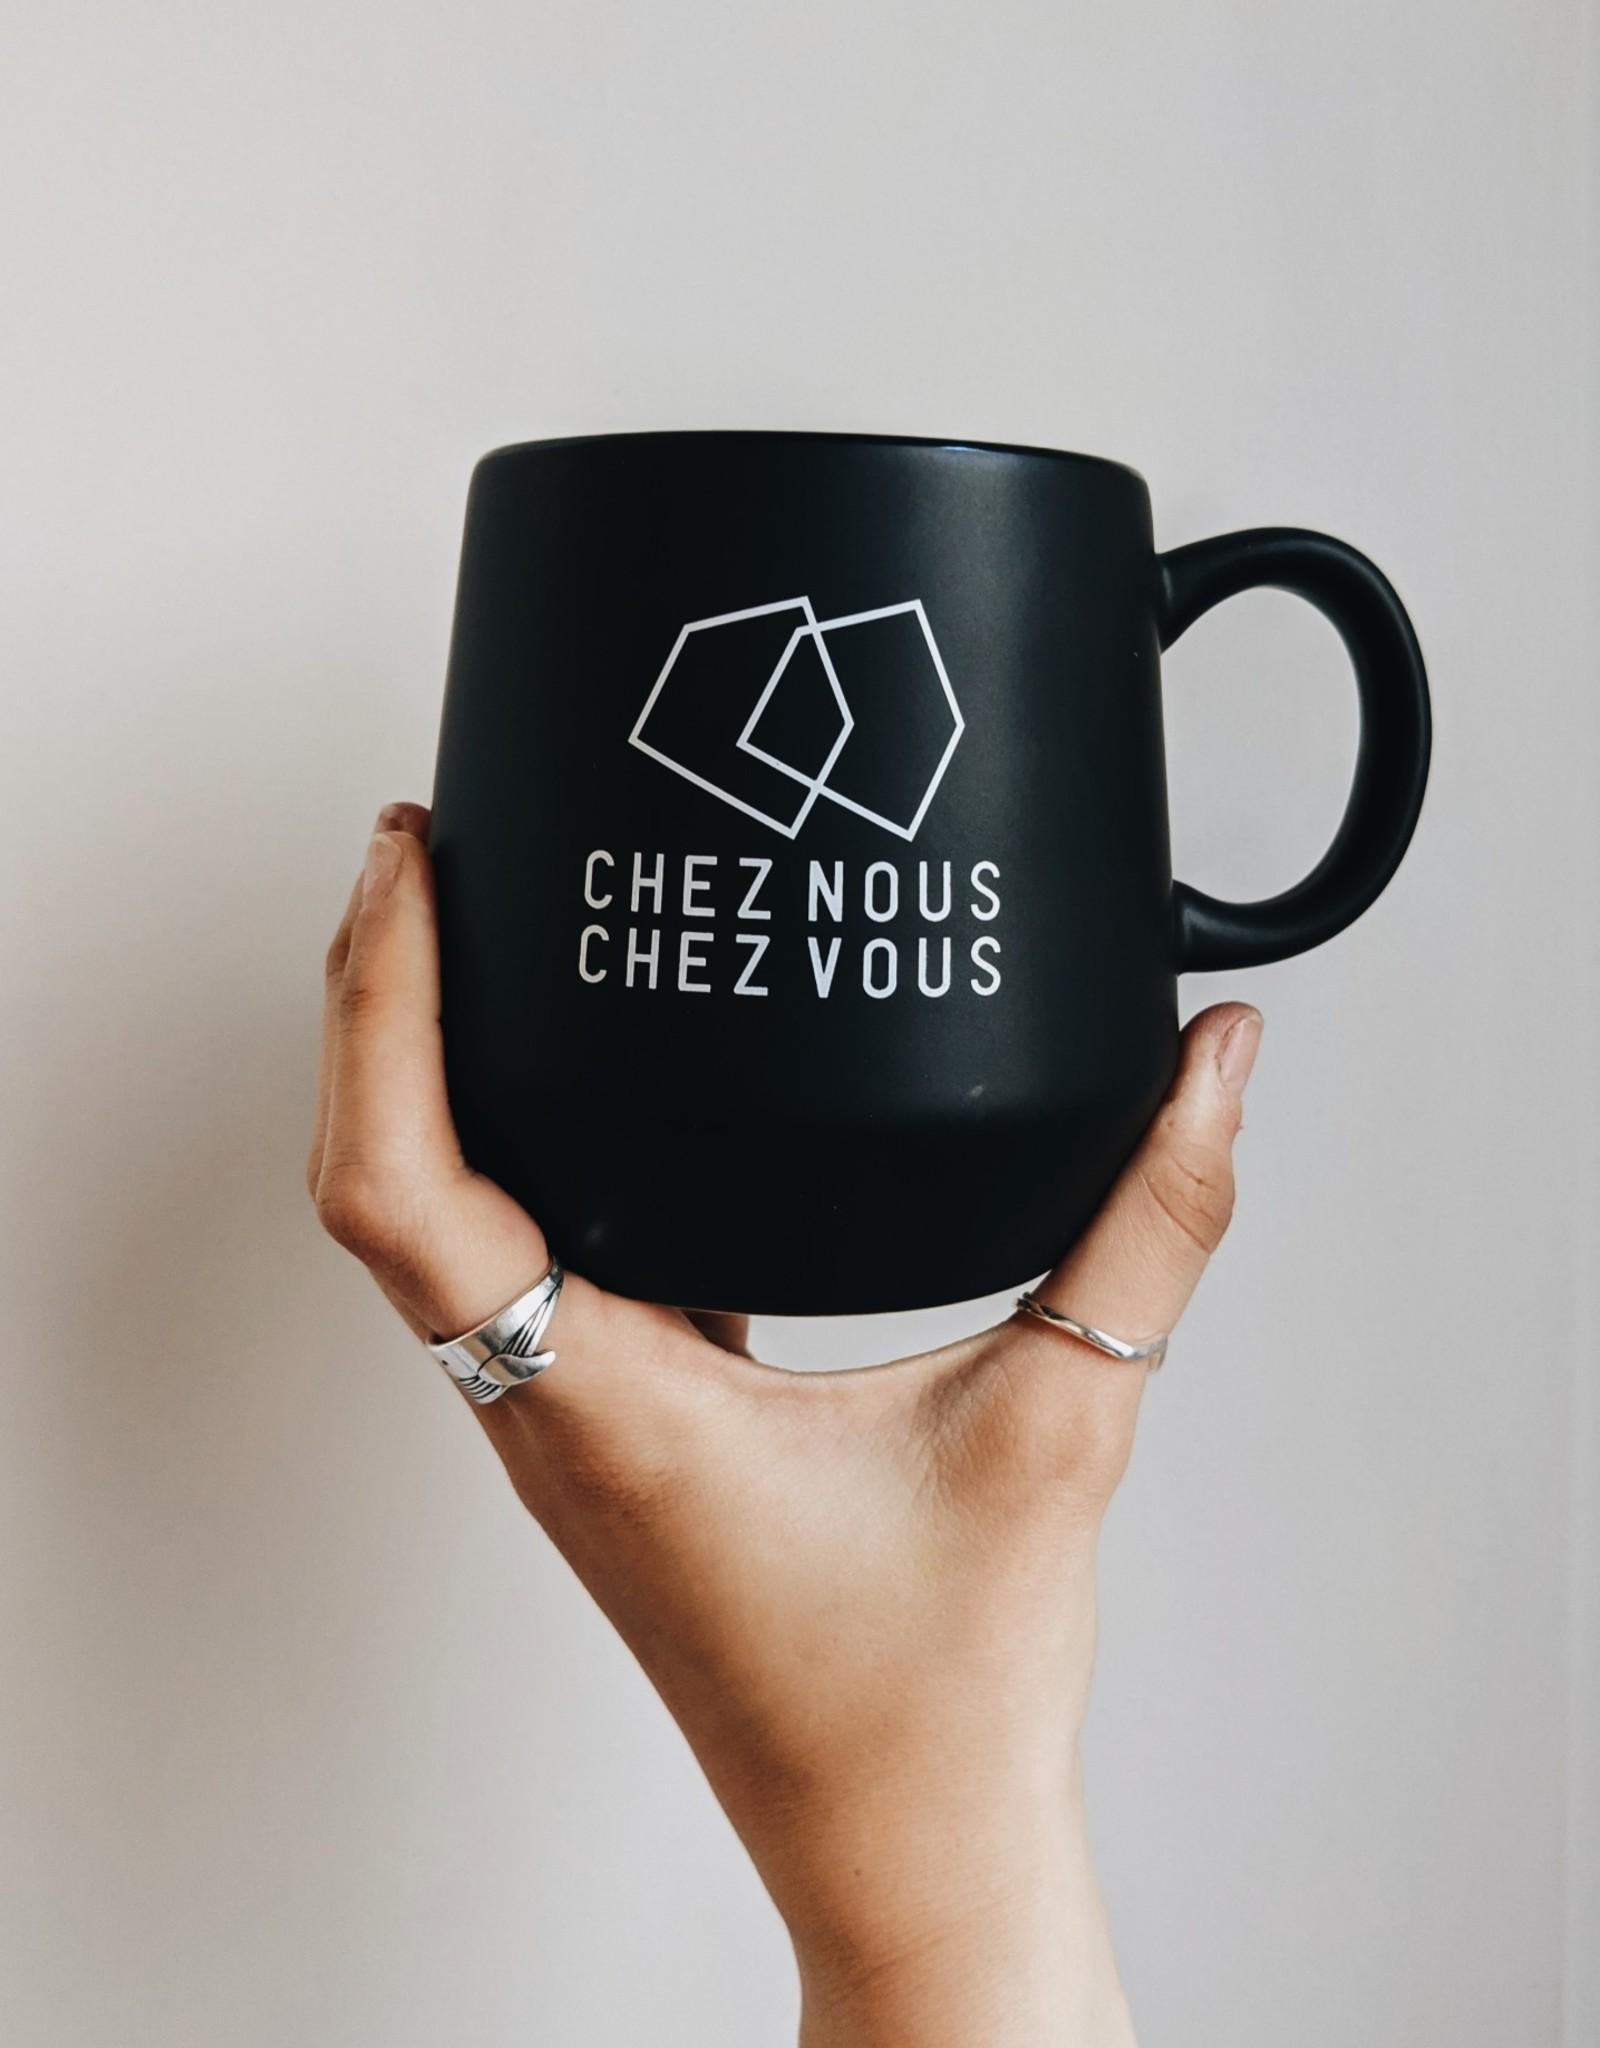 CHEZ NOUS CHEZ VOUS Mug Chez Nous Chez Vous